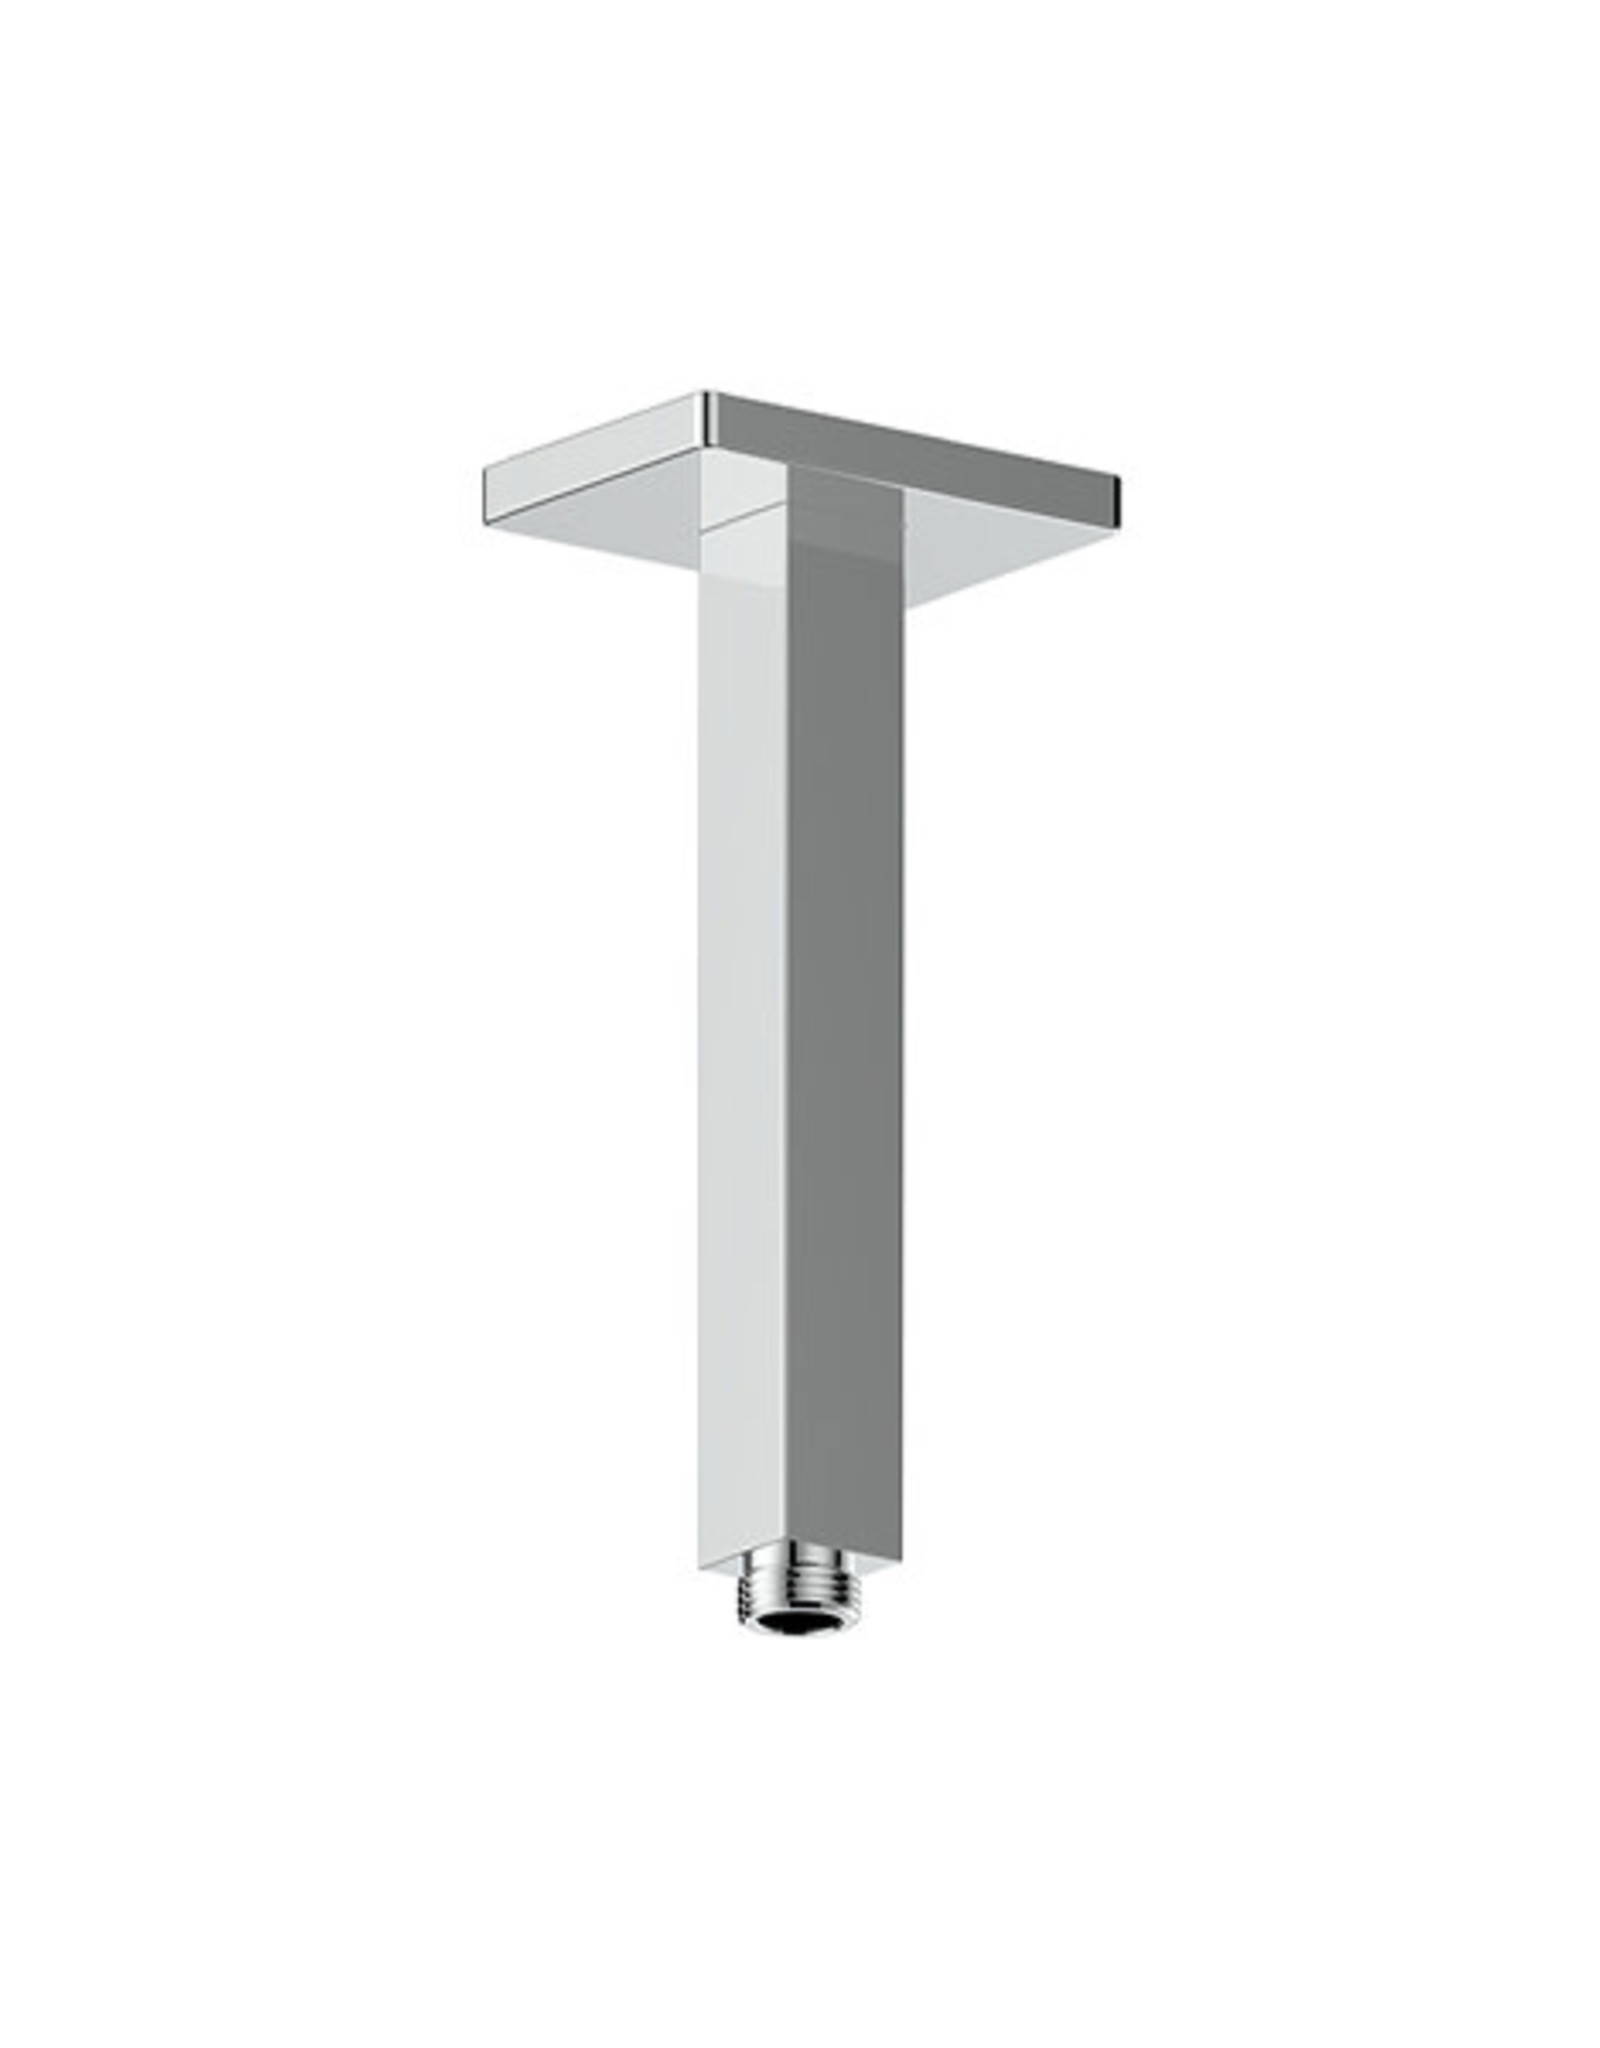 "Vogt 8"" Square Ceiling Mount Shower Arm- Chrome"